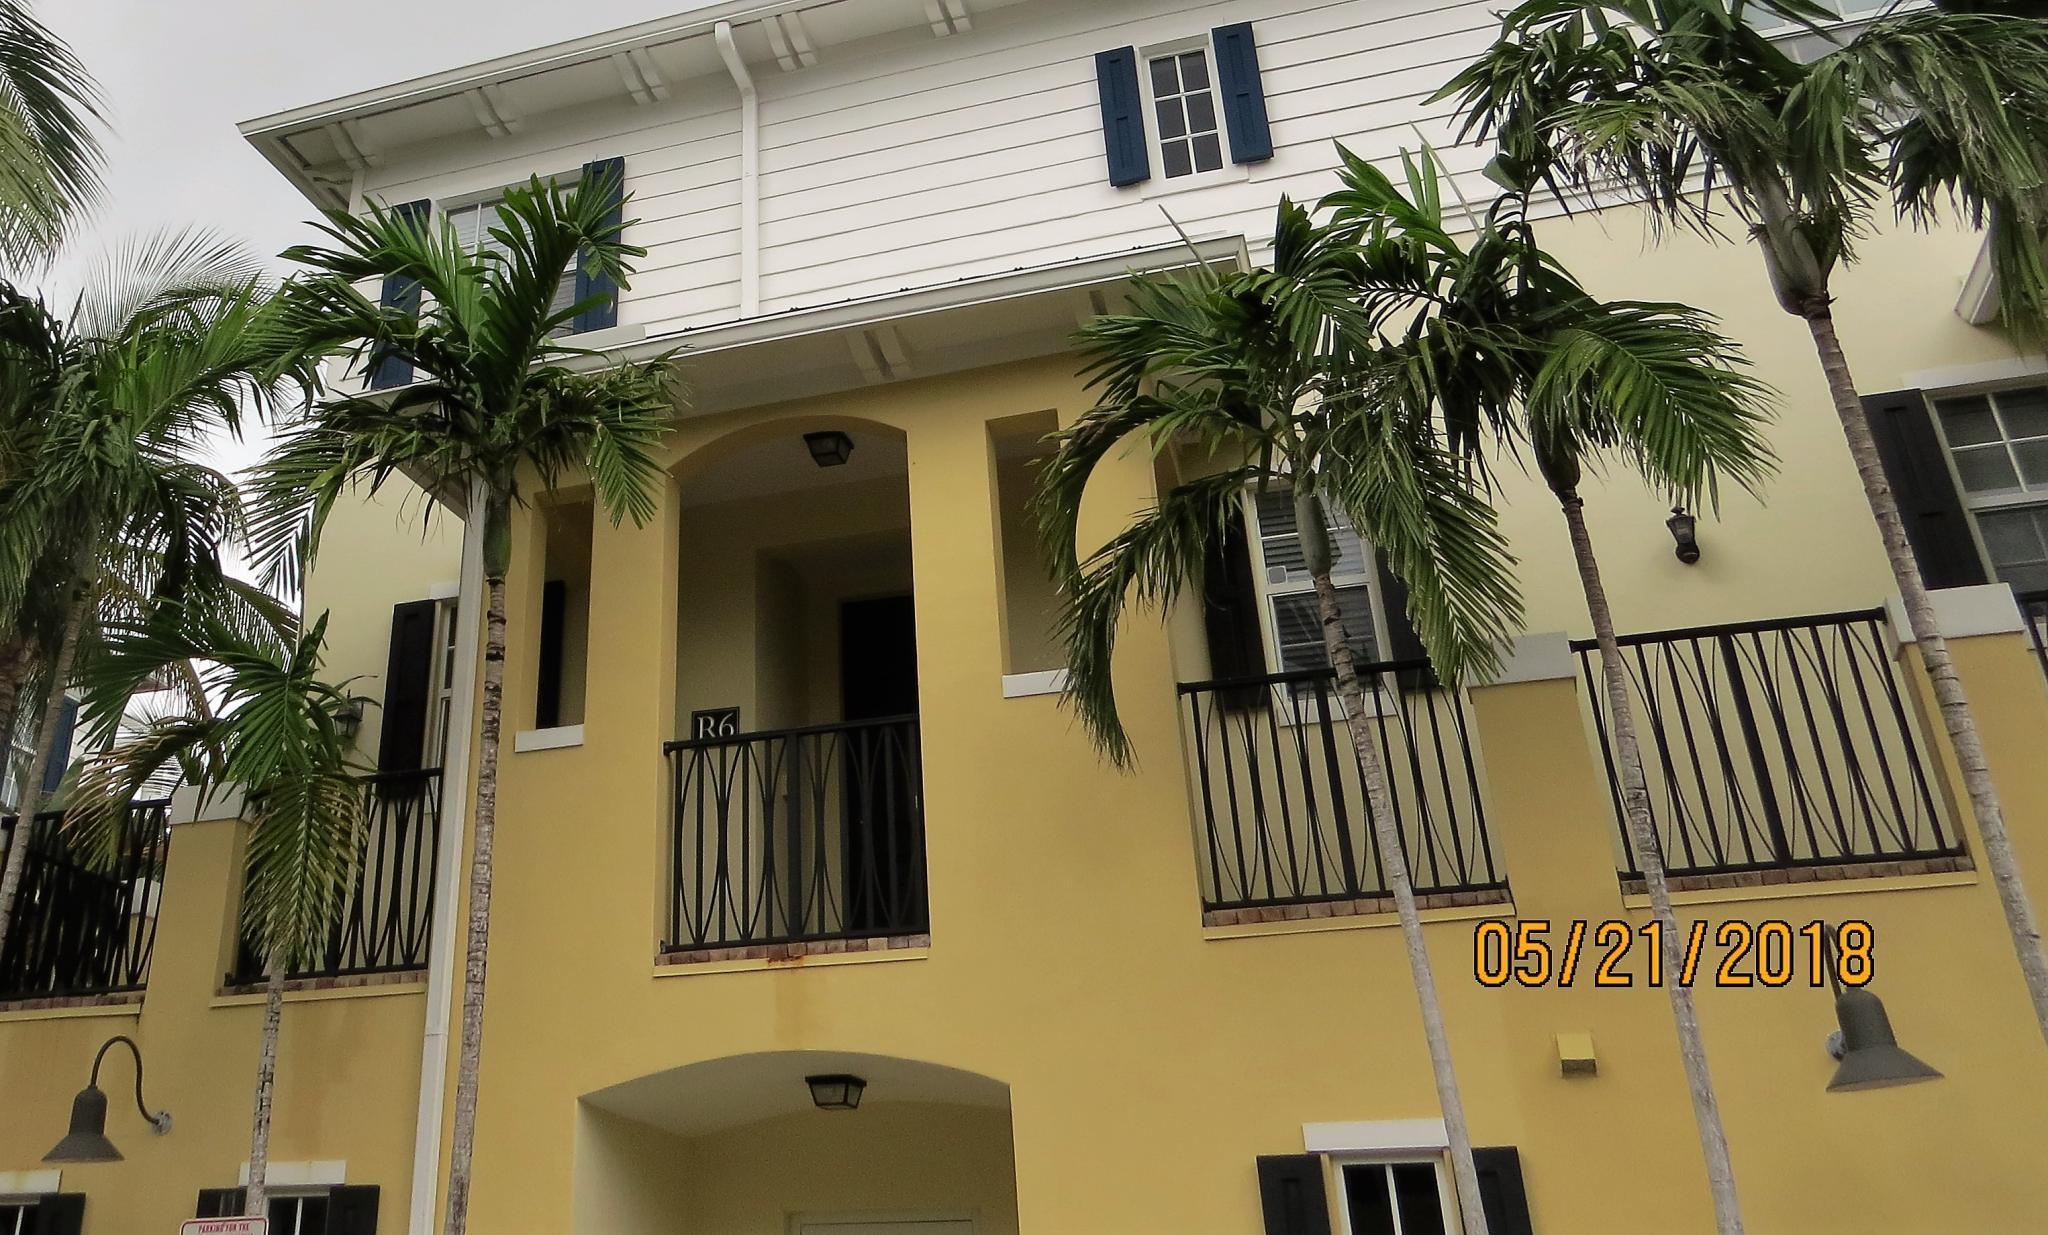 1930 S Dixie Hwy #R6, West Palm Beach, FL 33401 For Rent | Trulia